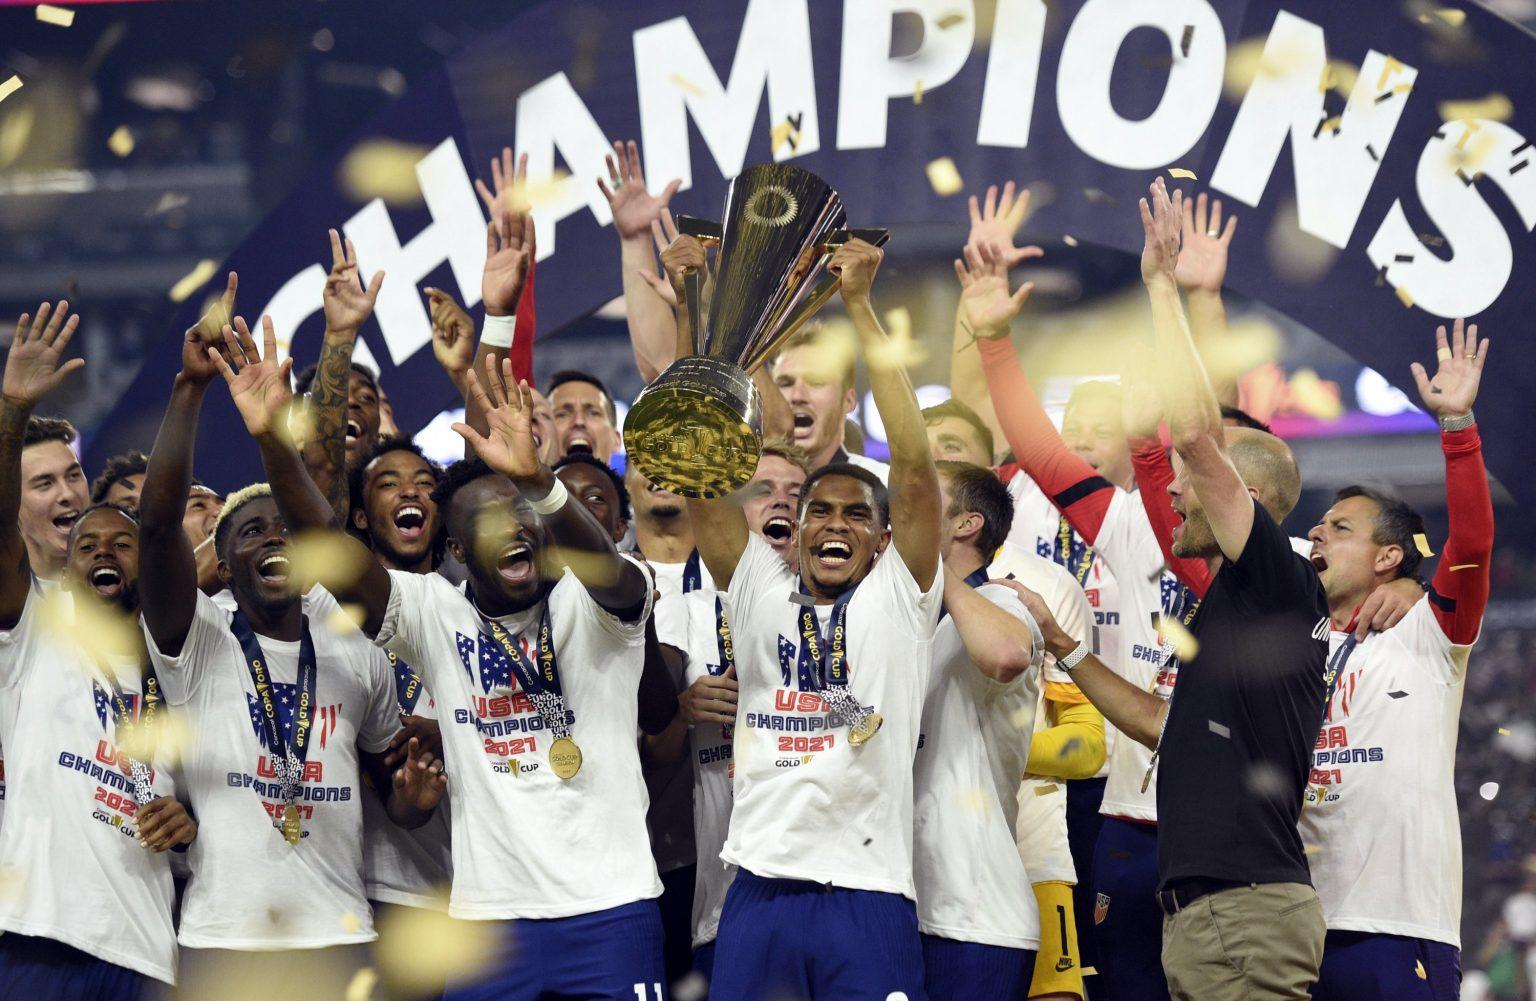 US clinches CONCACAF Gold Cup in football| ഫുട്ബോളിൽ CONCACAF ഗോൾഡ് കപ്പ് US നേടി_40.1